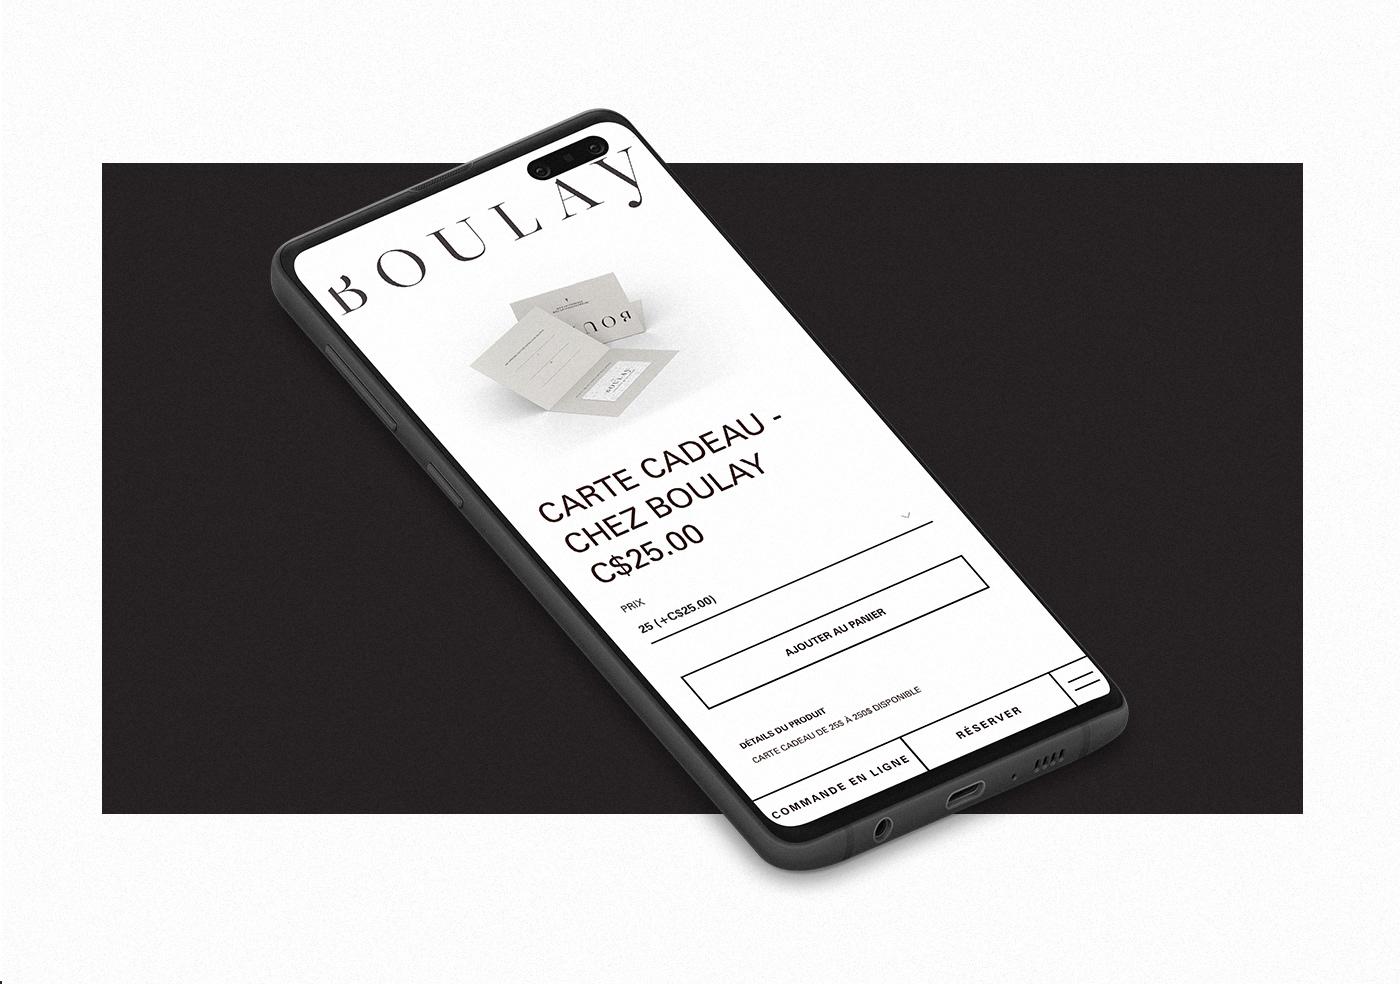 Image may contain: print, mobile phone and screenshot